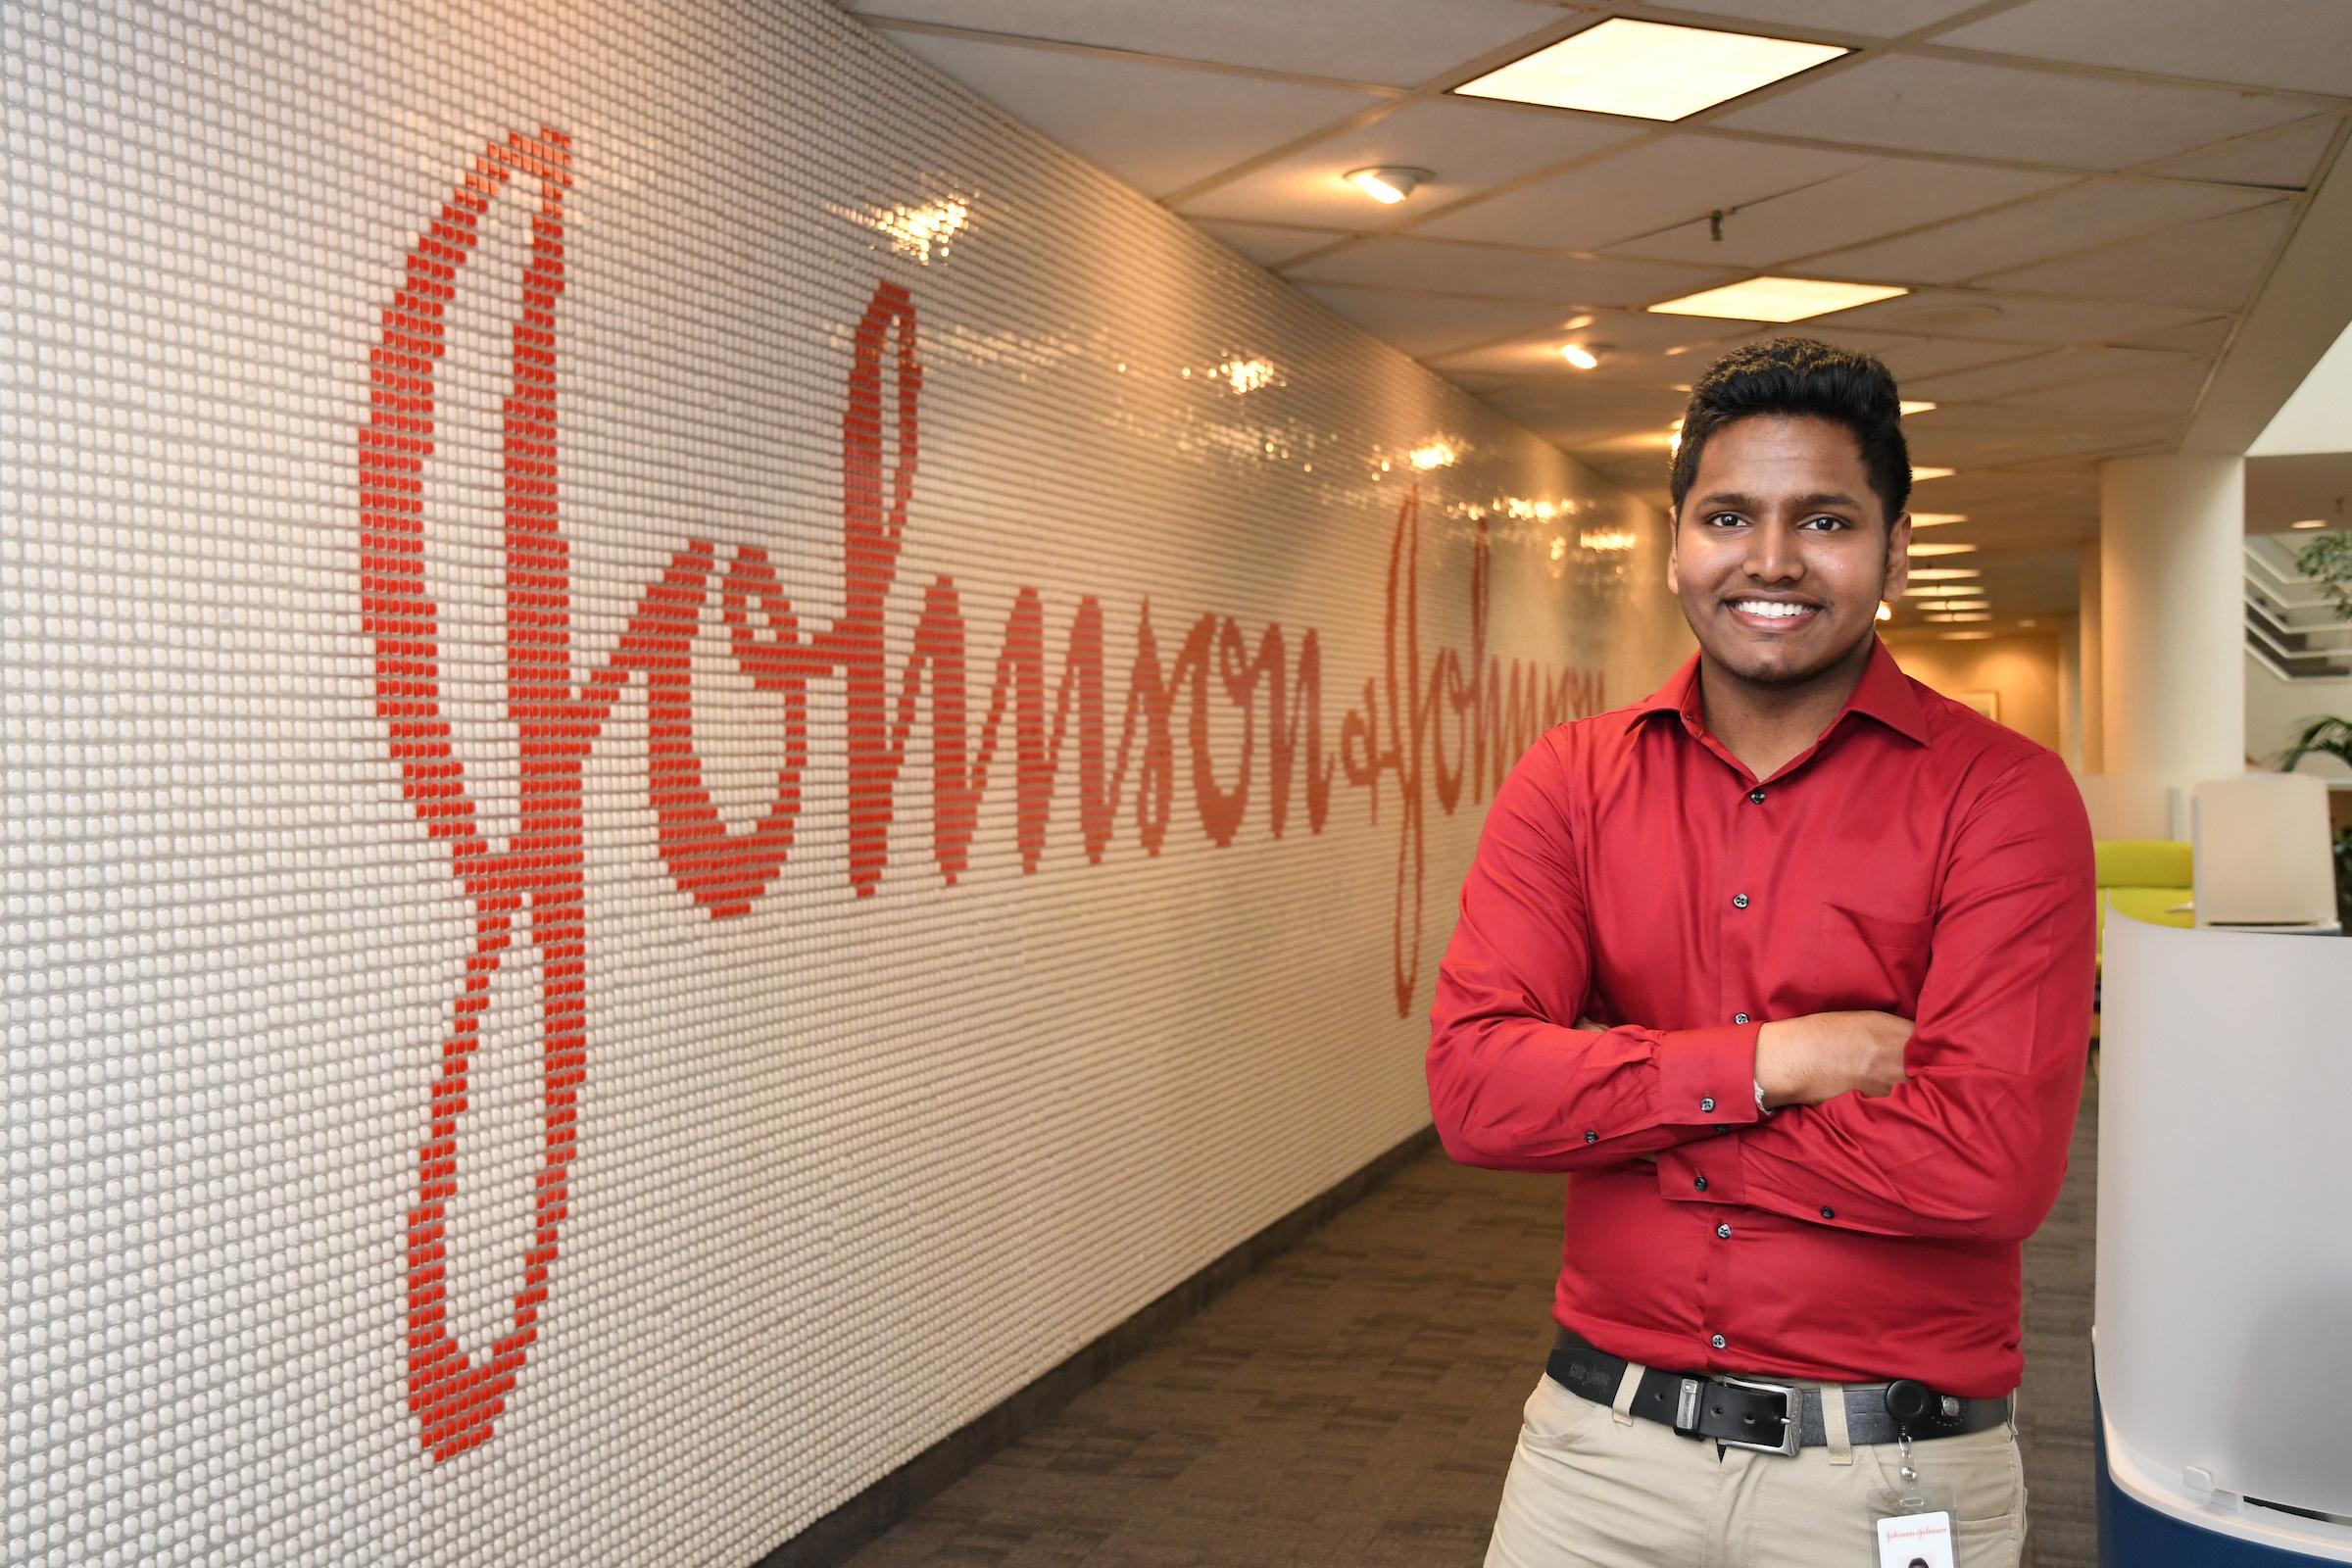 Rider student Vivekkumar Govindaswamy at Johnson & Johnson co-op